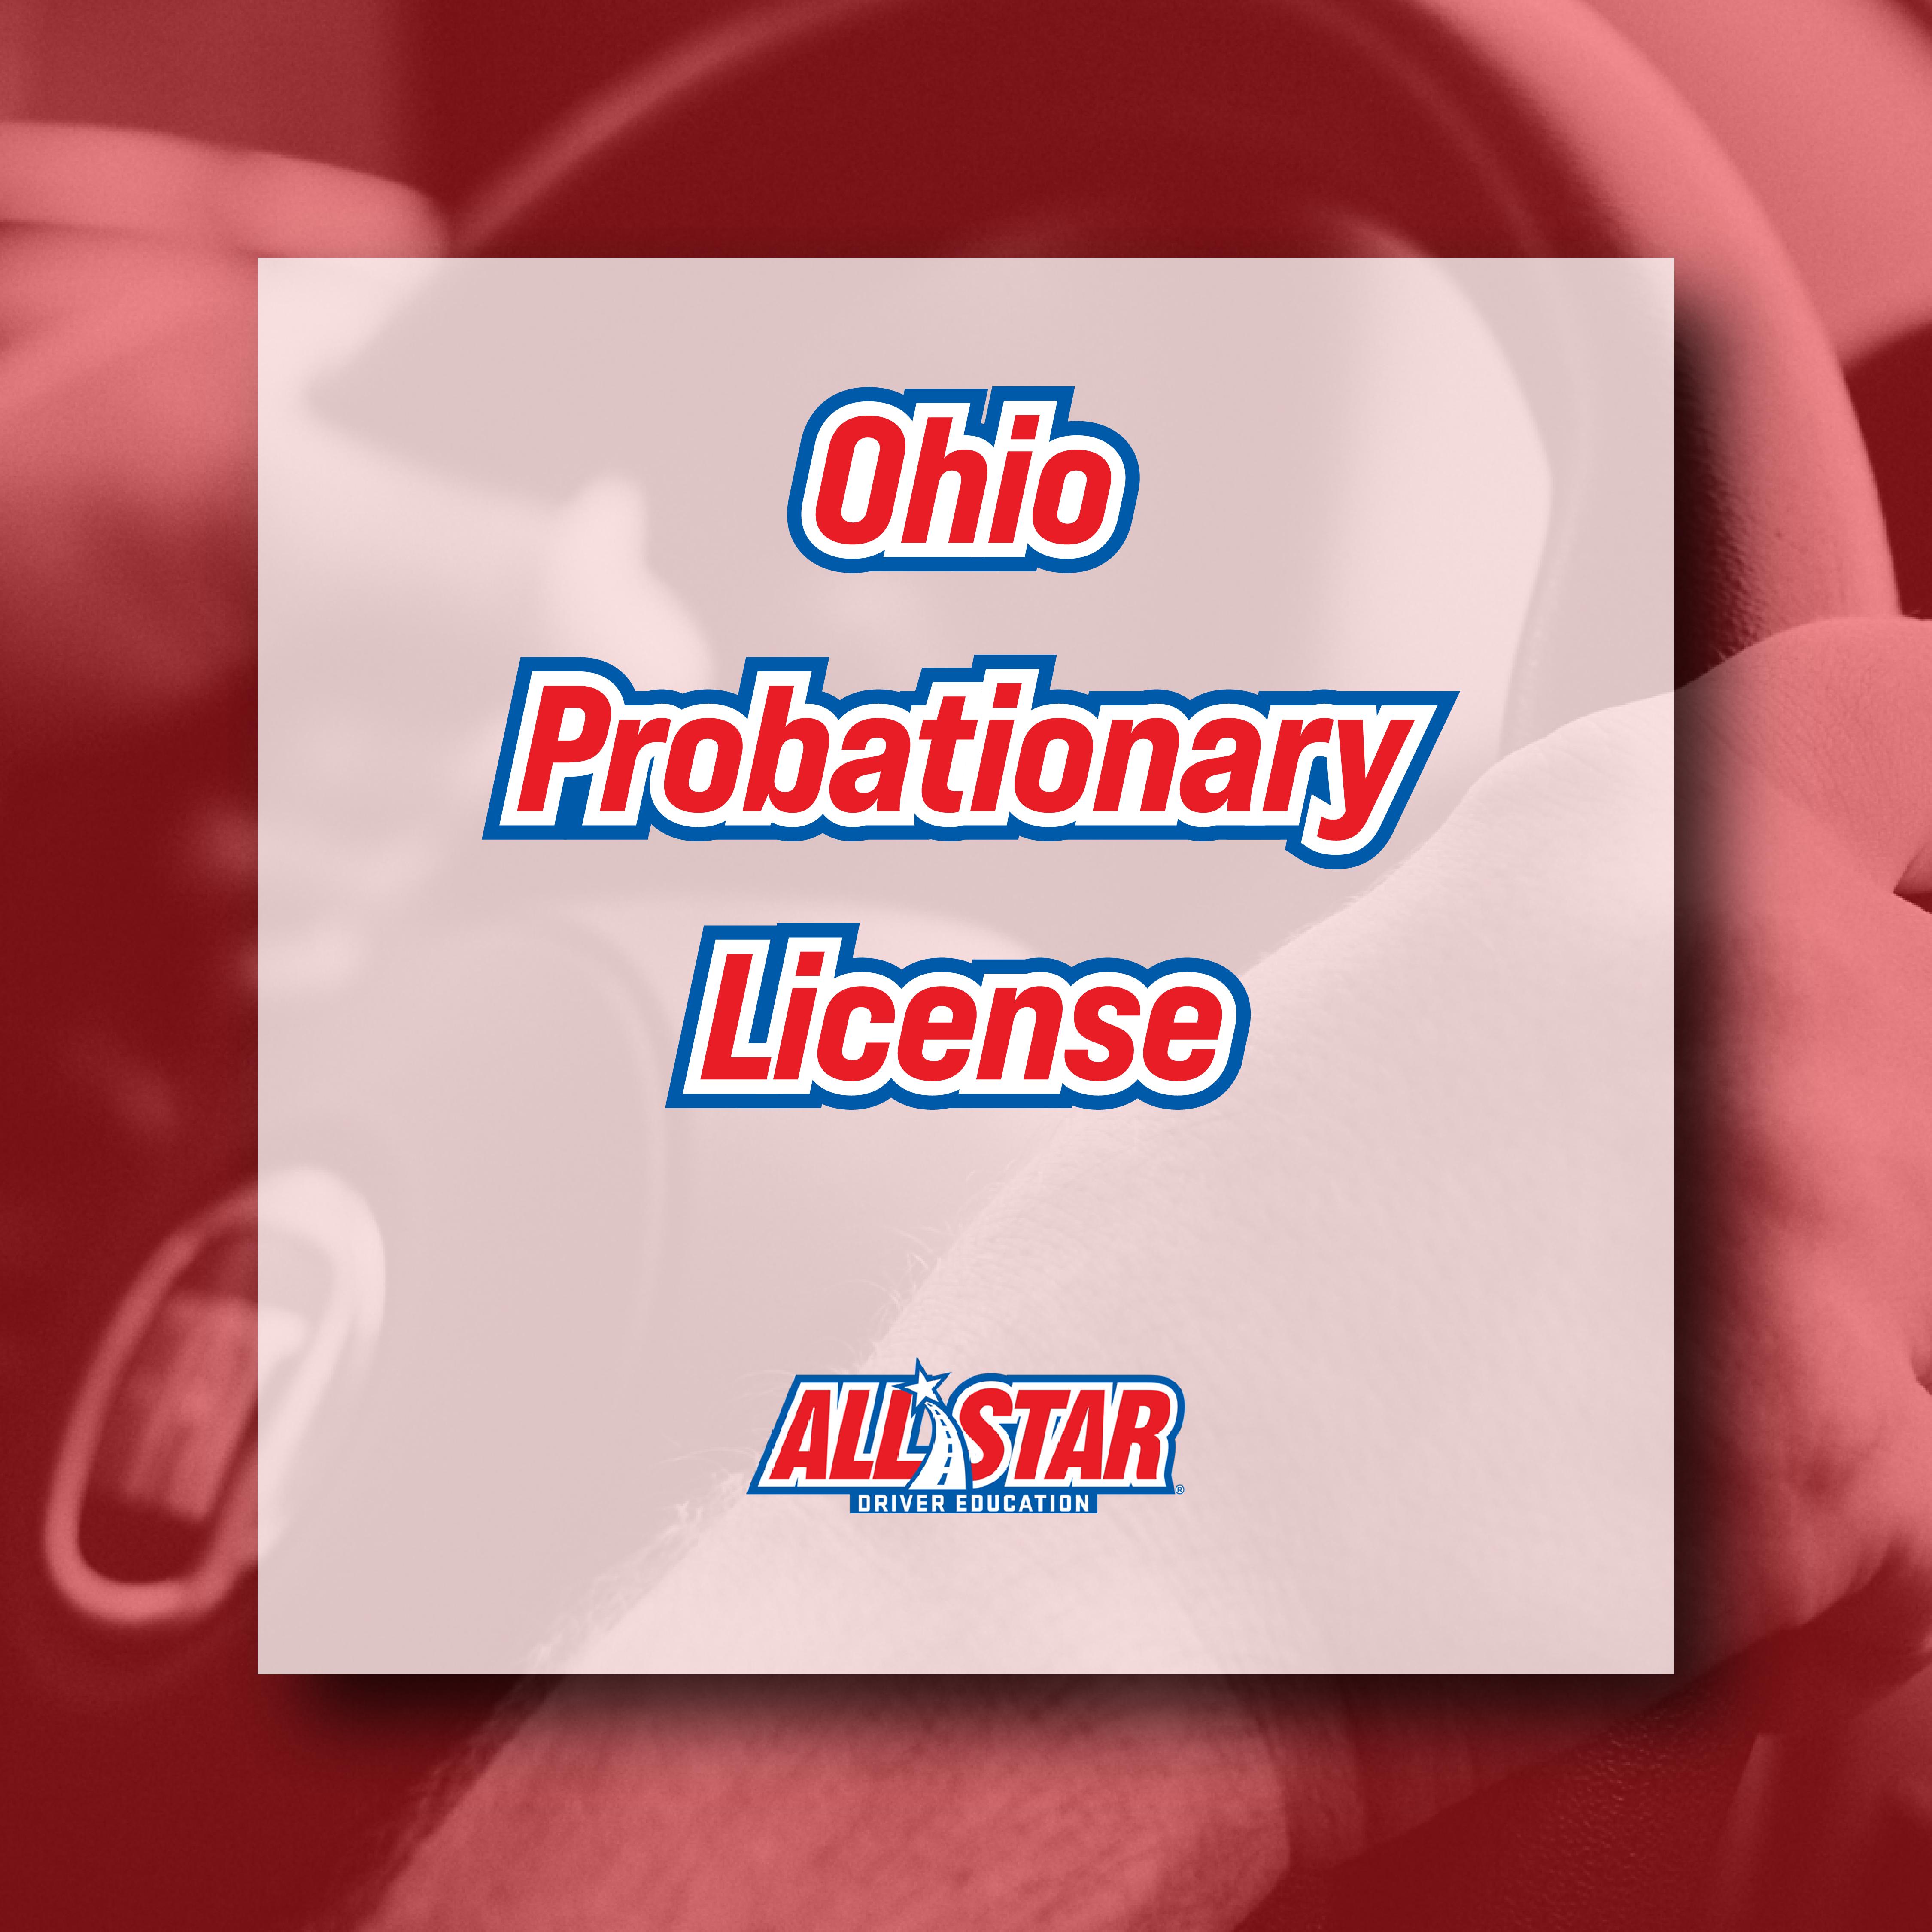 ohio probationary license